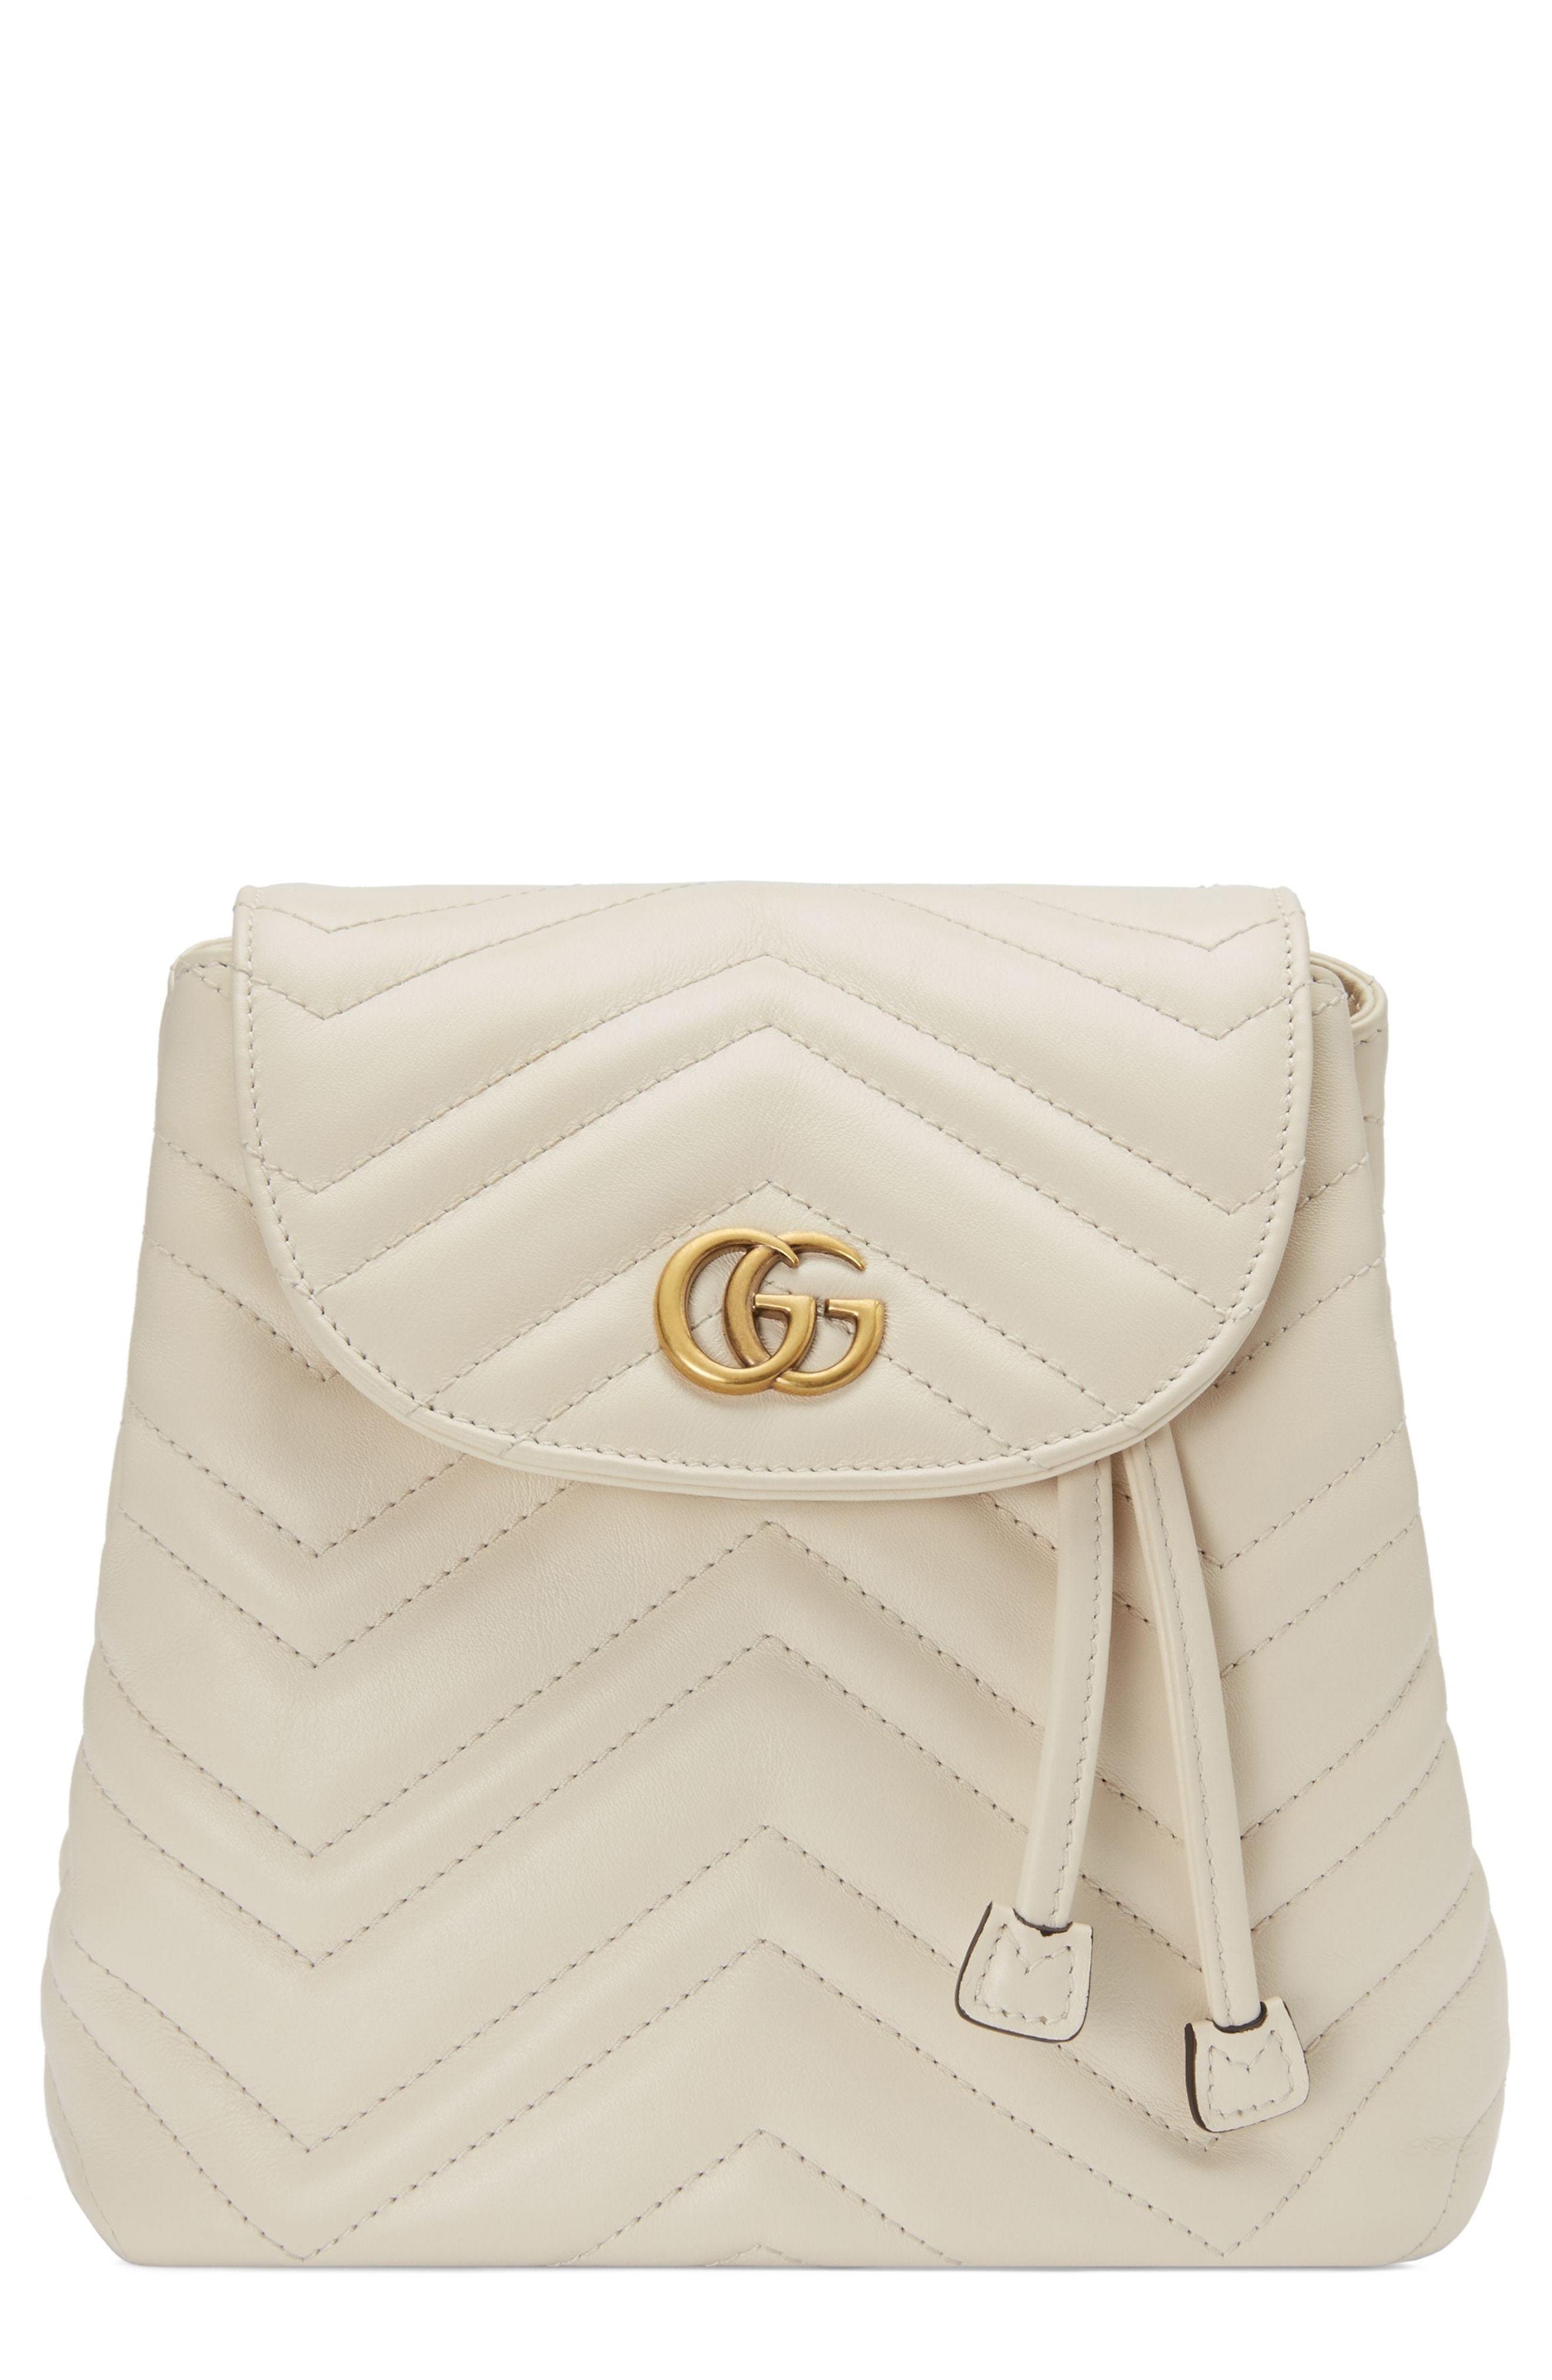 ffd0fd6e9323 Gucci Gg Marmont 20 Matelasse Leather Mini Backpack, $1,980 ...